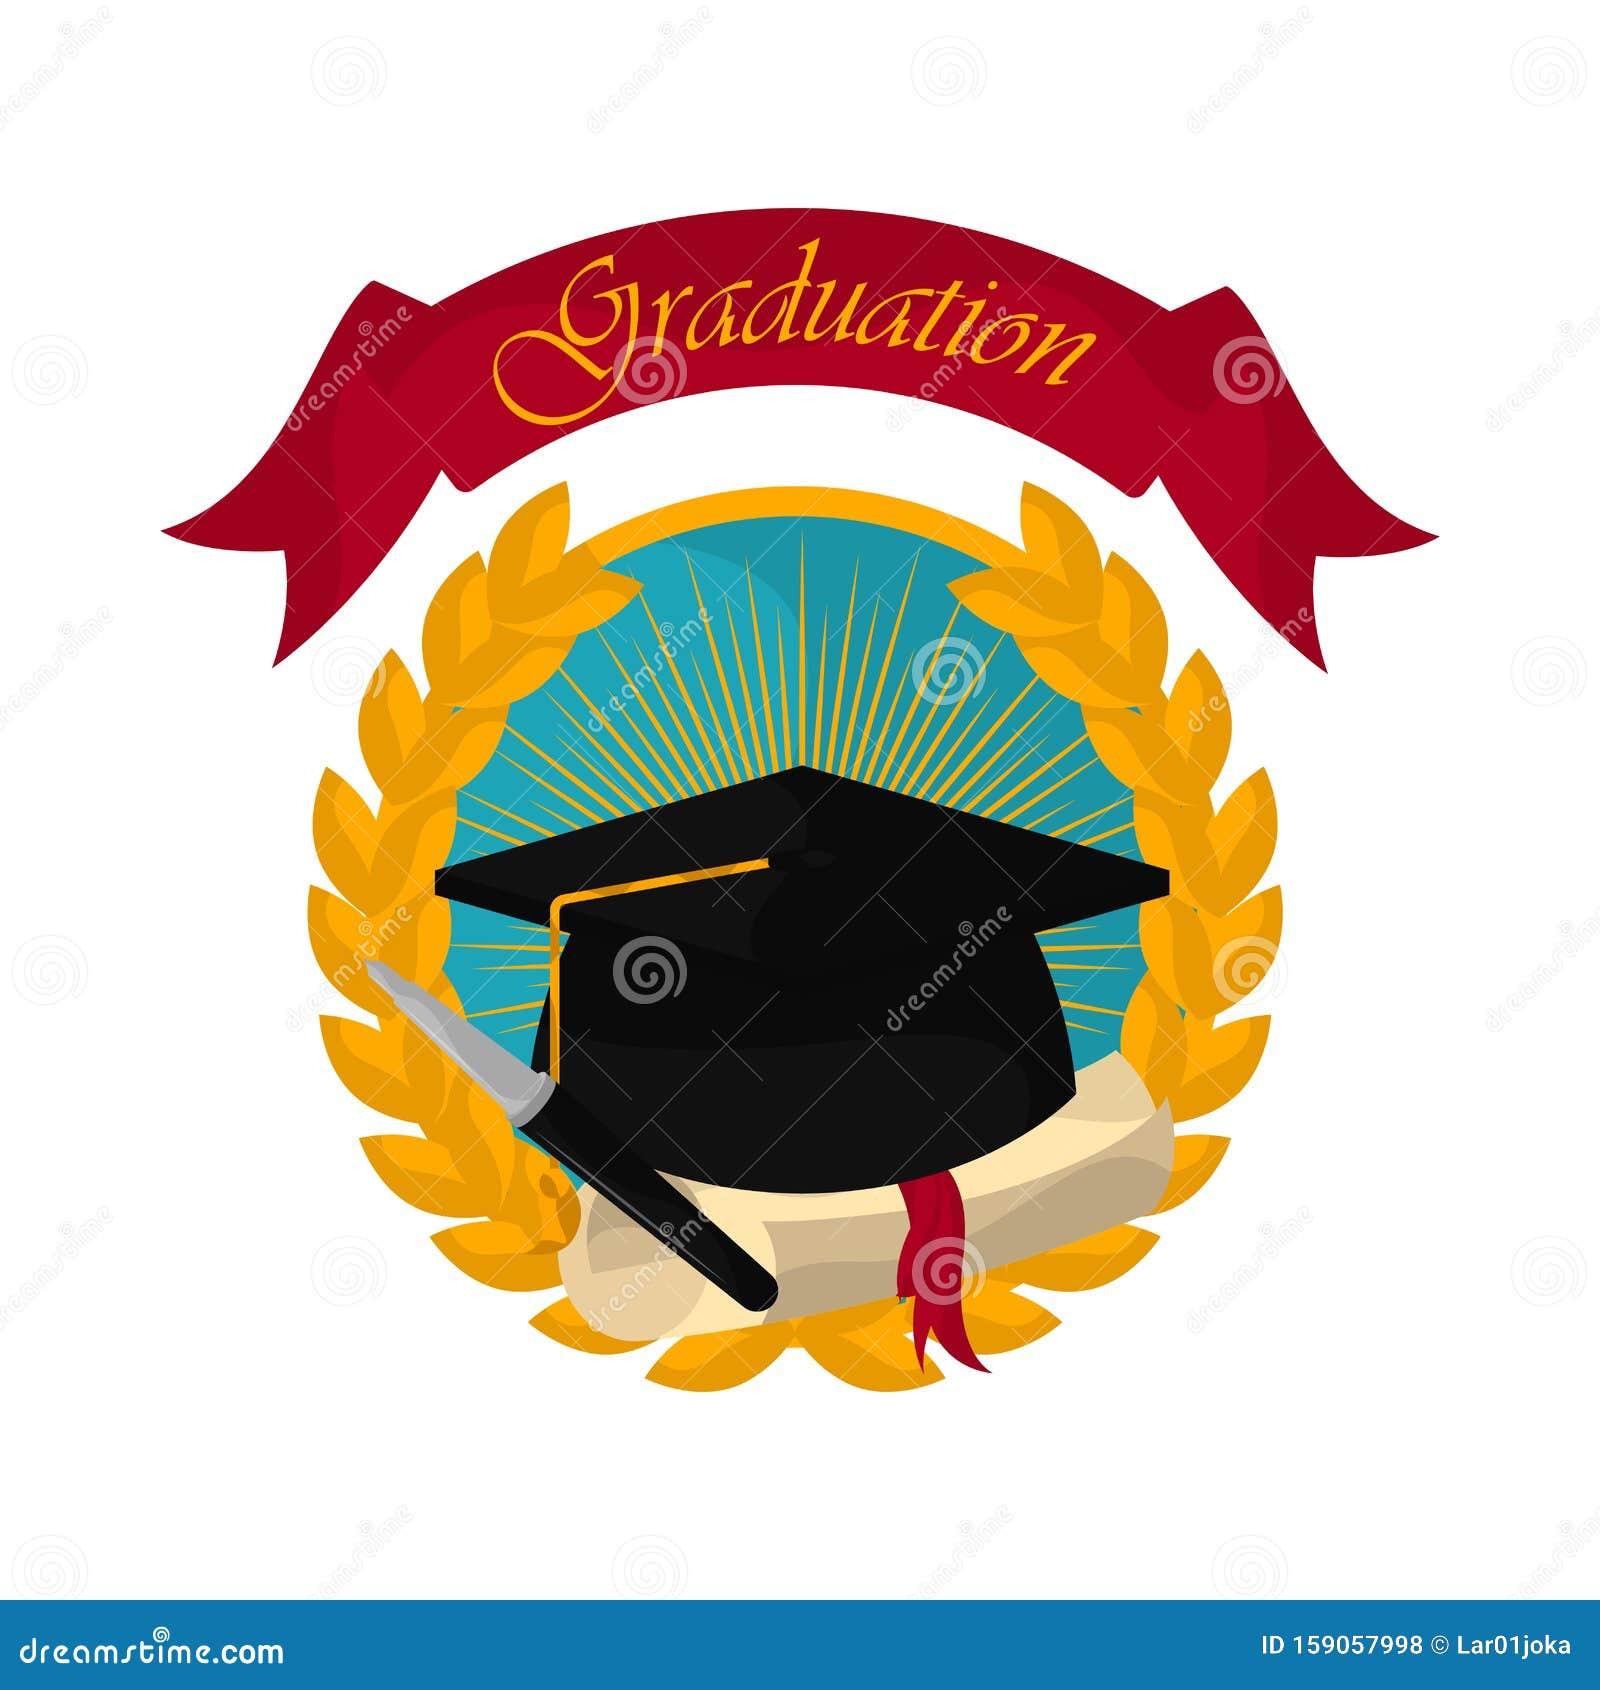 Graduation objects illustration